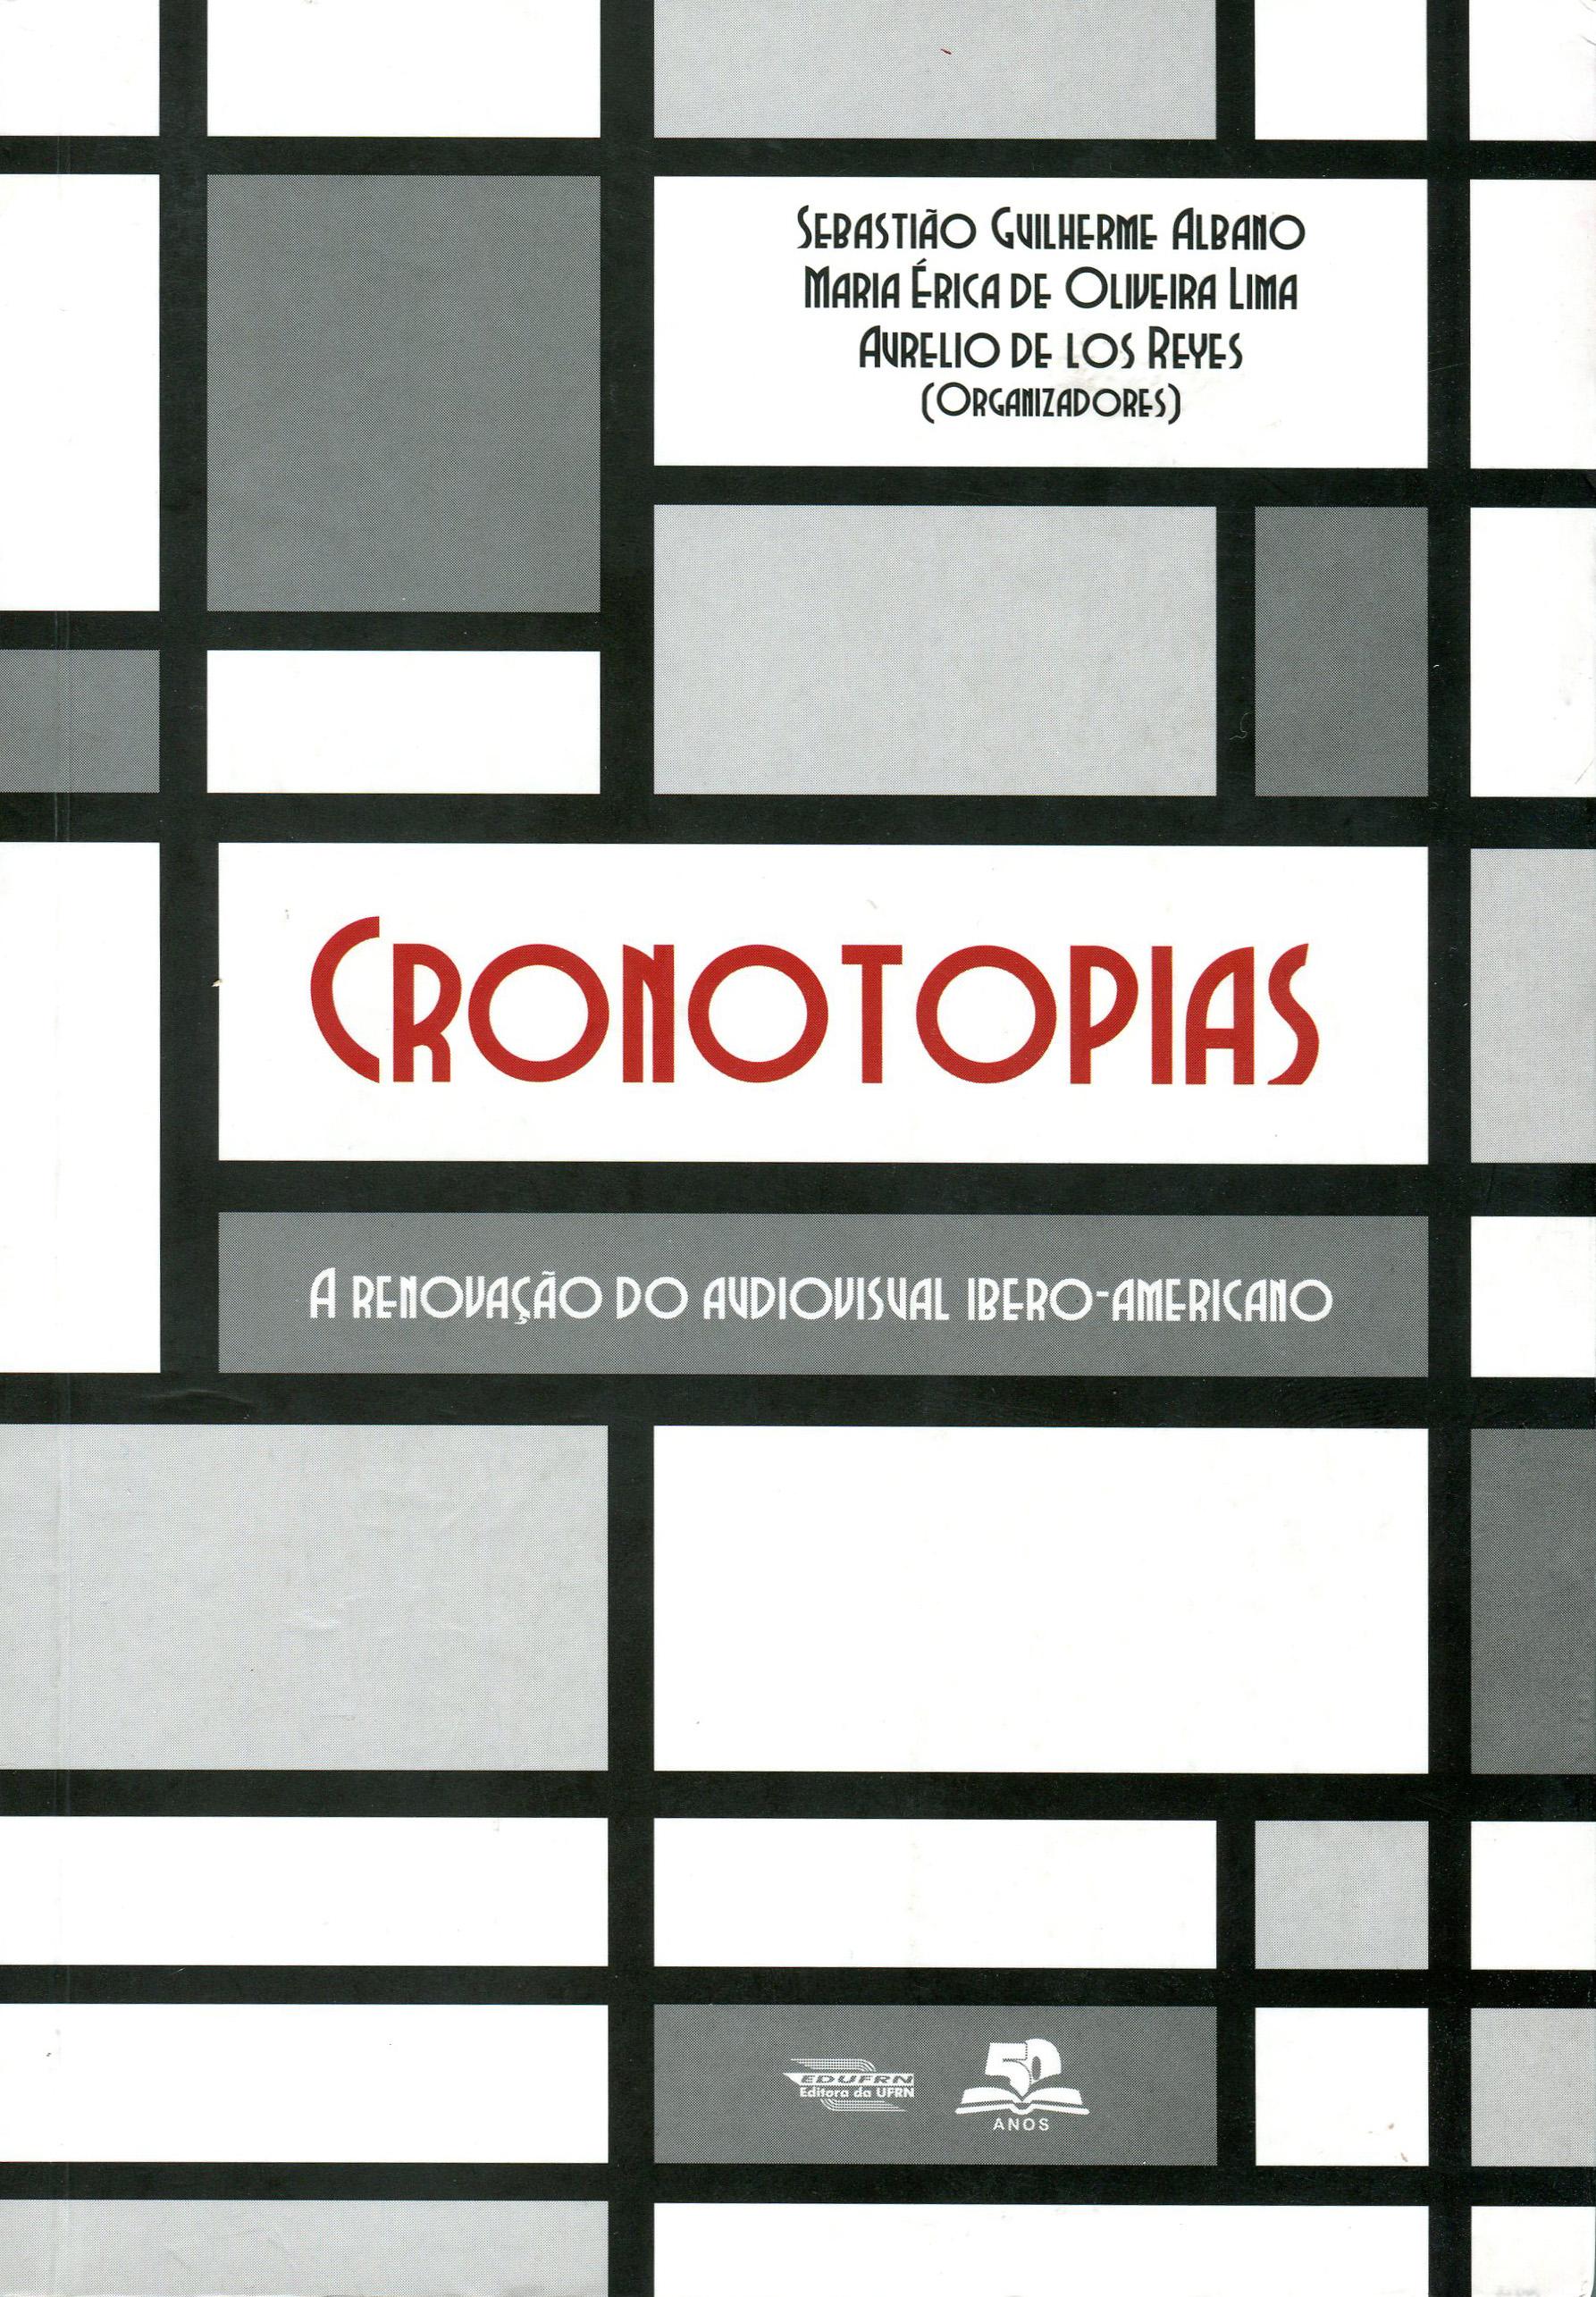 Cronotopias